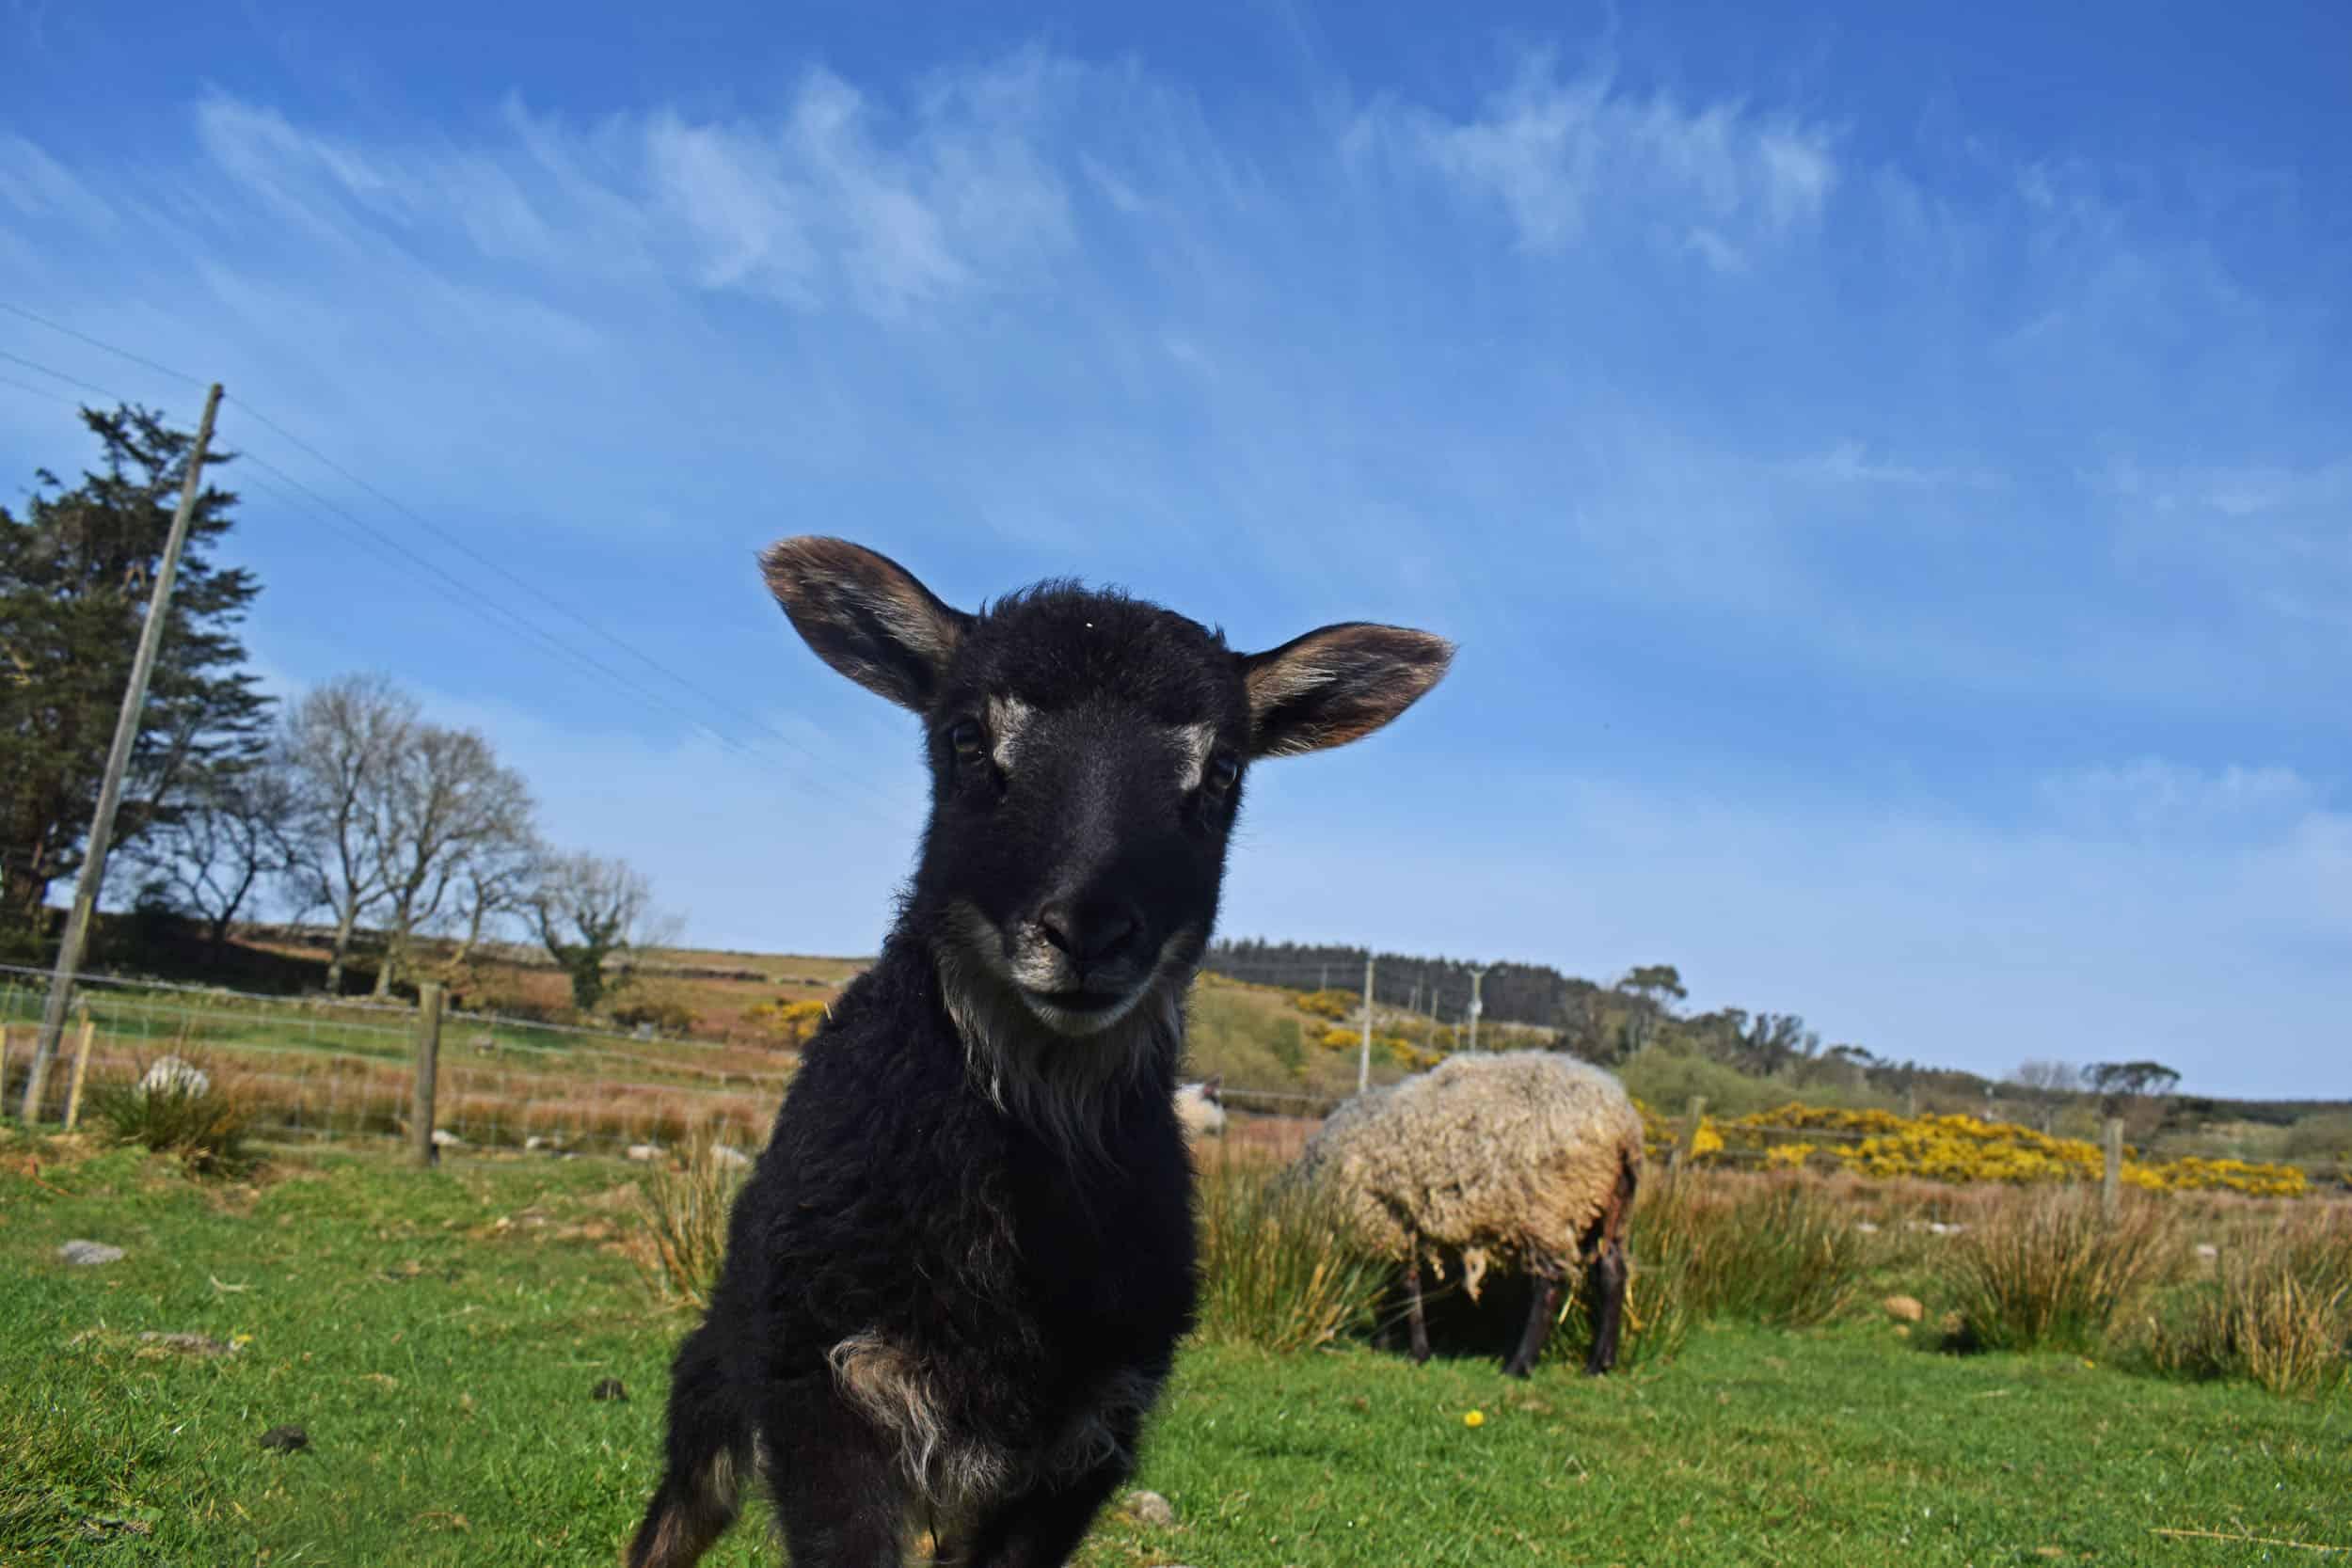 Astrid gotland cross icelandic grey mouflon patchwork sheep wool felted fleece rug ethical kind lamb